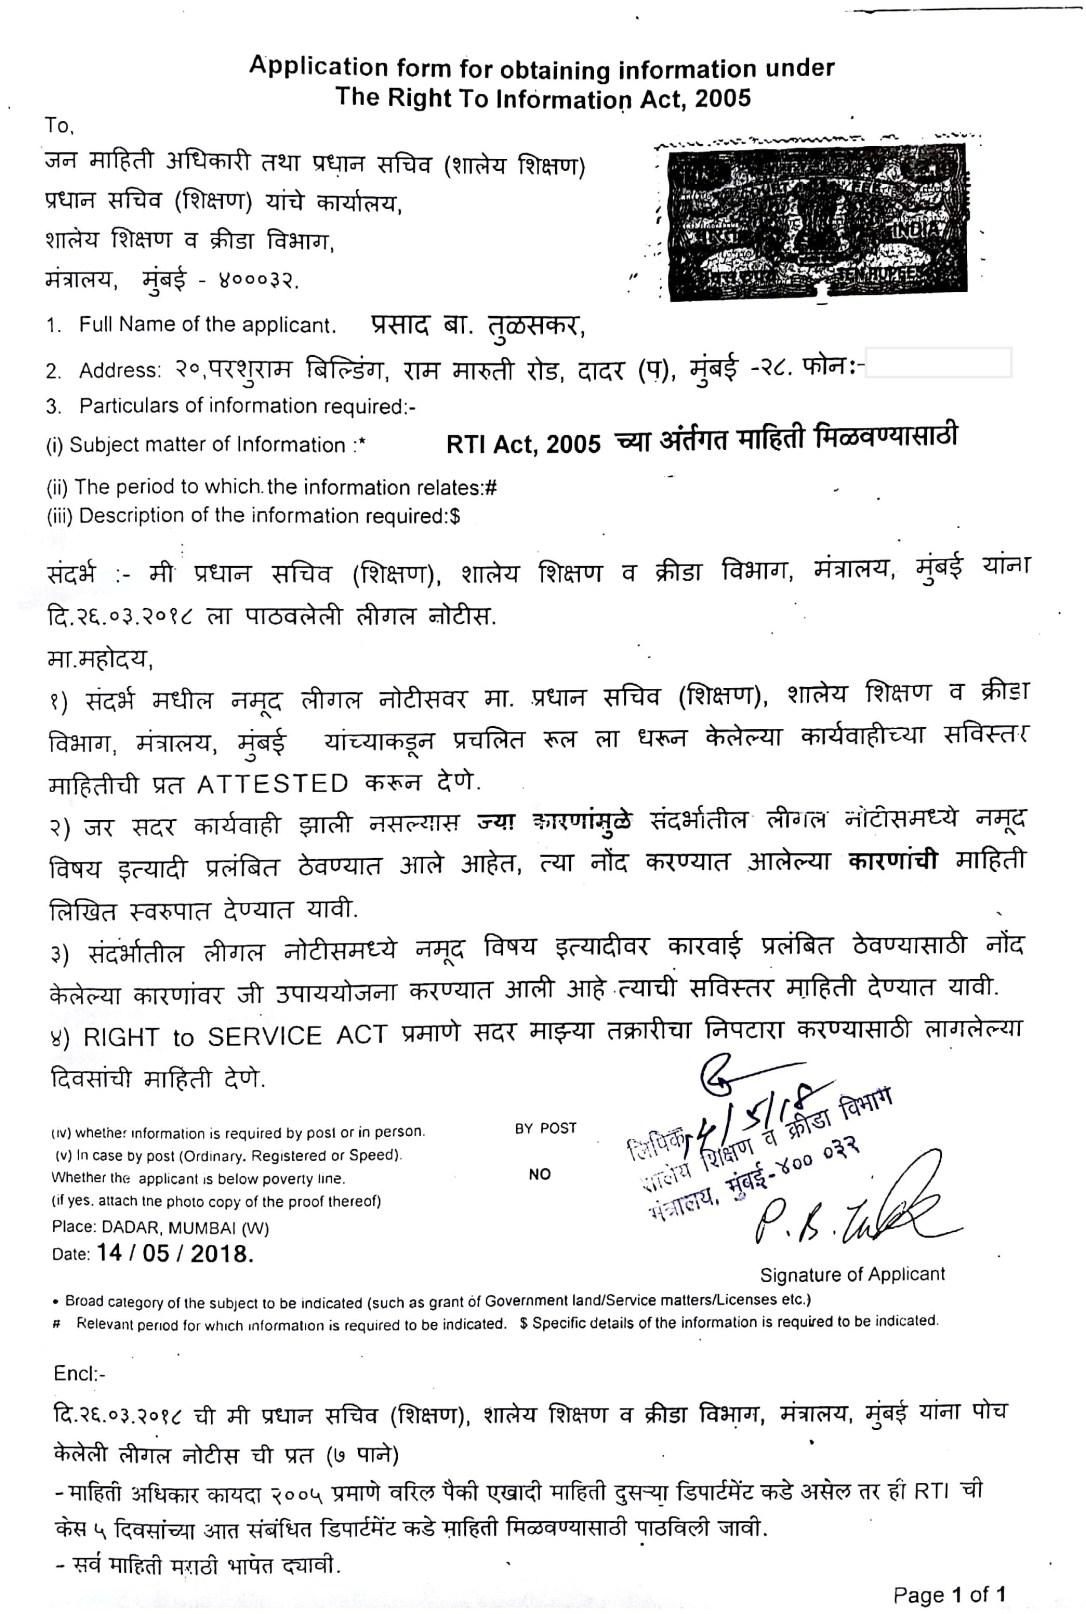 First RTI Application of Mr.Prasad Tulaskar Dtd.14.05.2018 asking for action taken report against complaint notice Dtd.26.03.2018